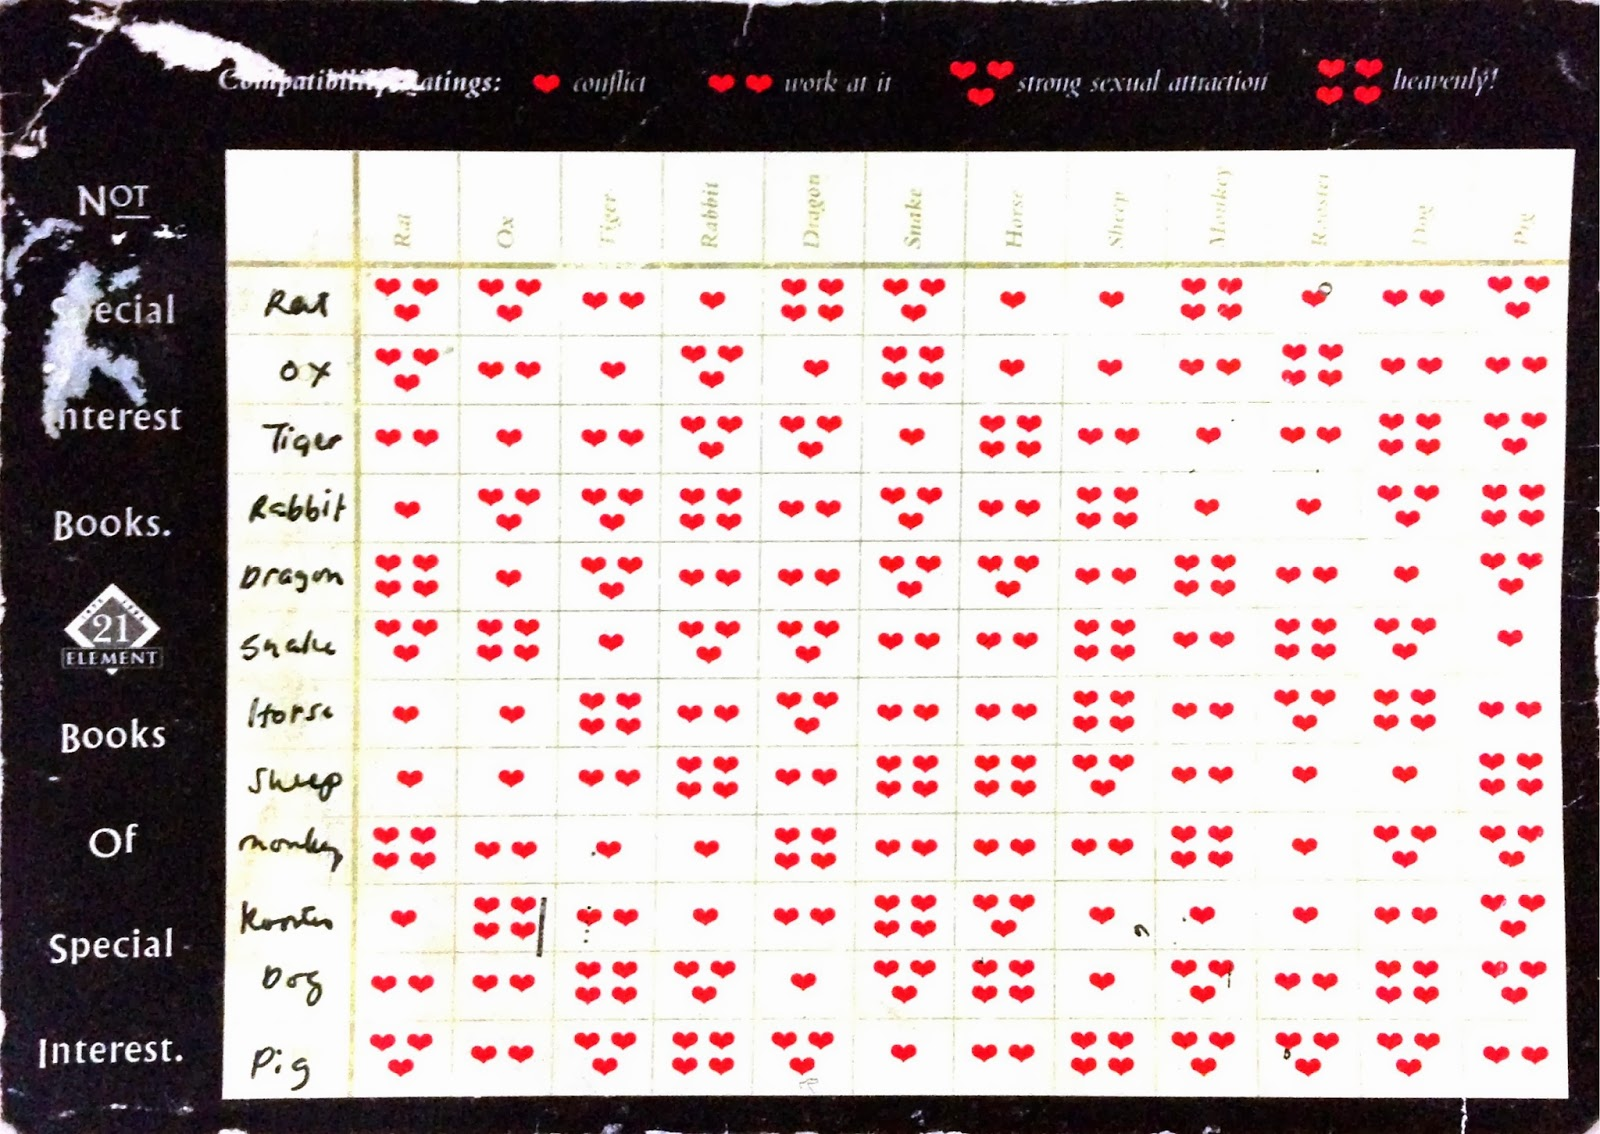 Relationship Compatibility Charts Also Timiznceptzmusic Rh